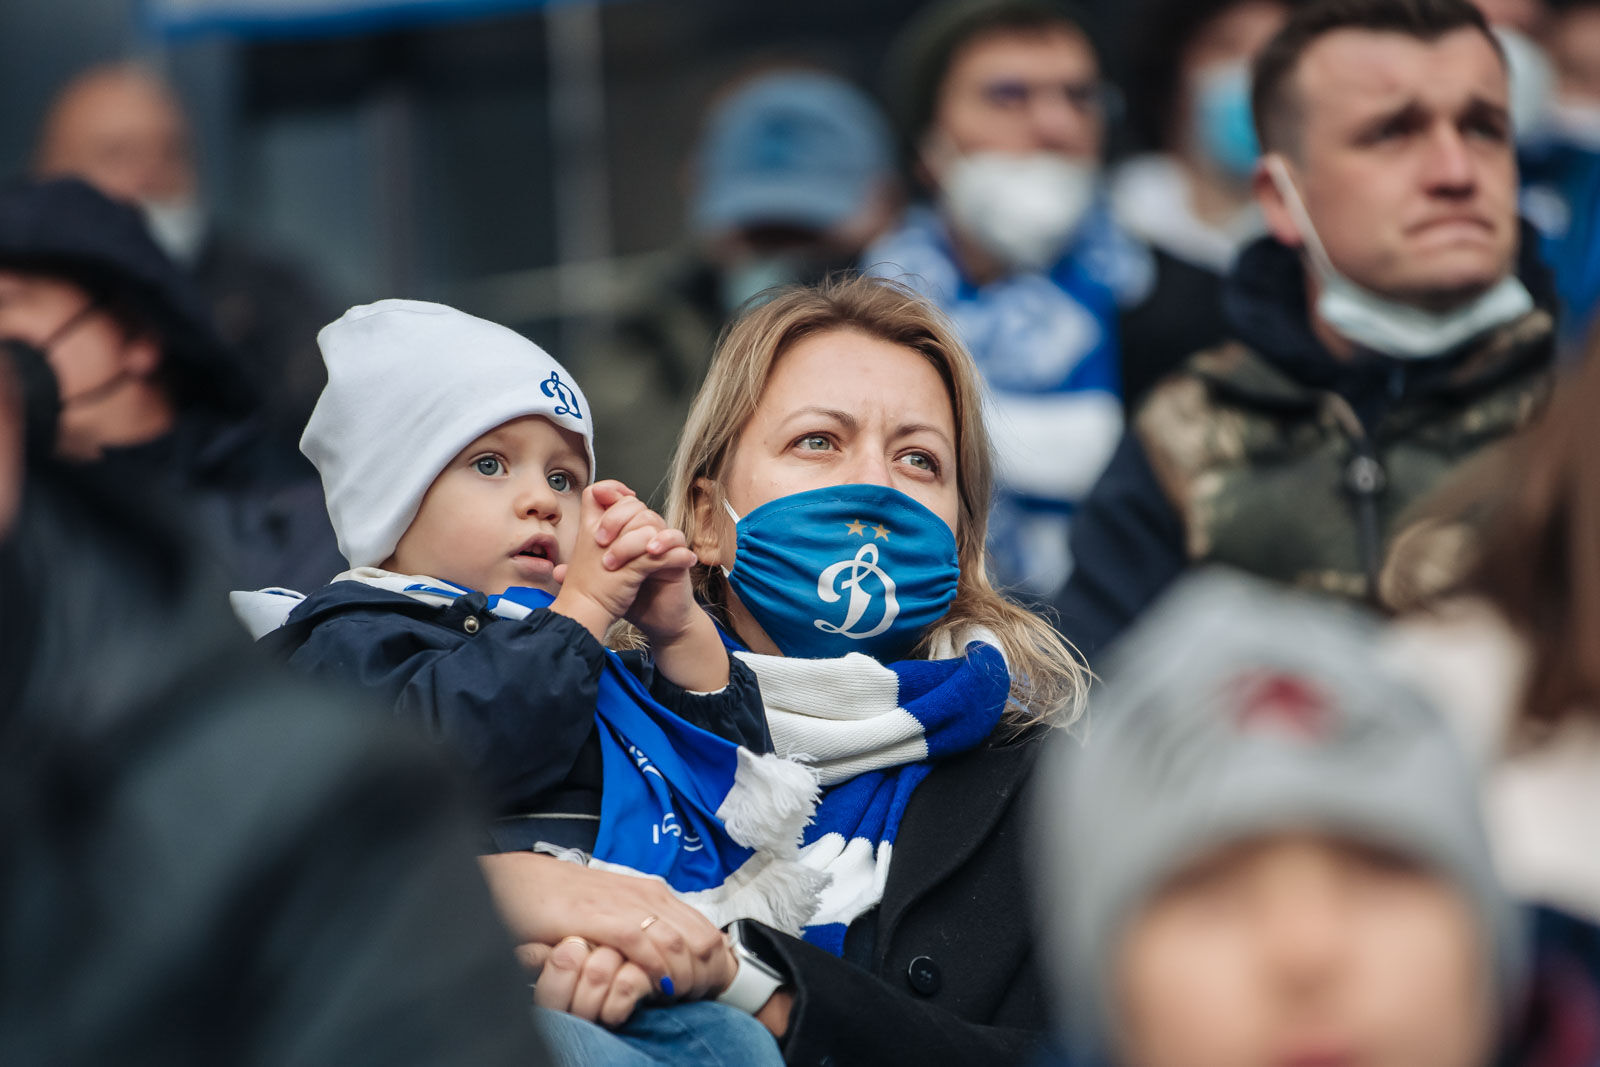 Fans at the Dynamo vs Krylia Sovetov match